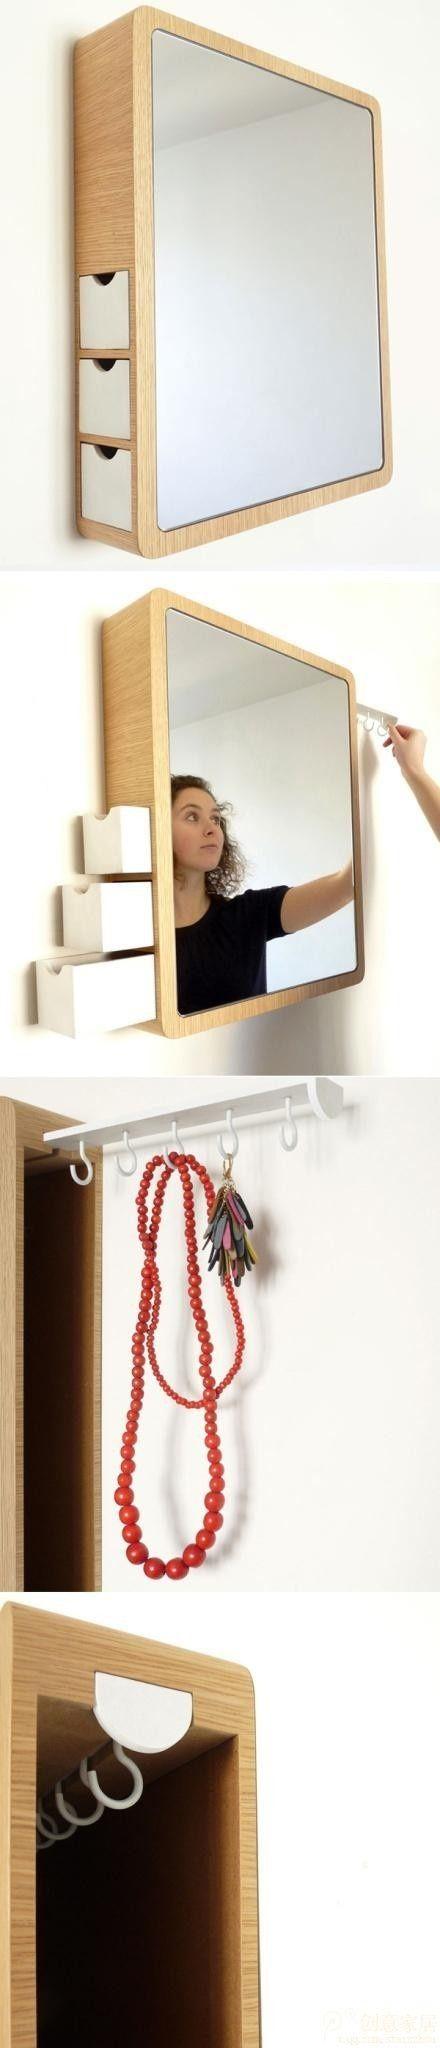 Mirror by Les M Studio